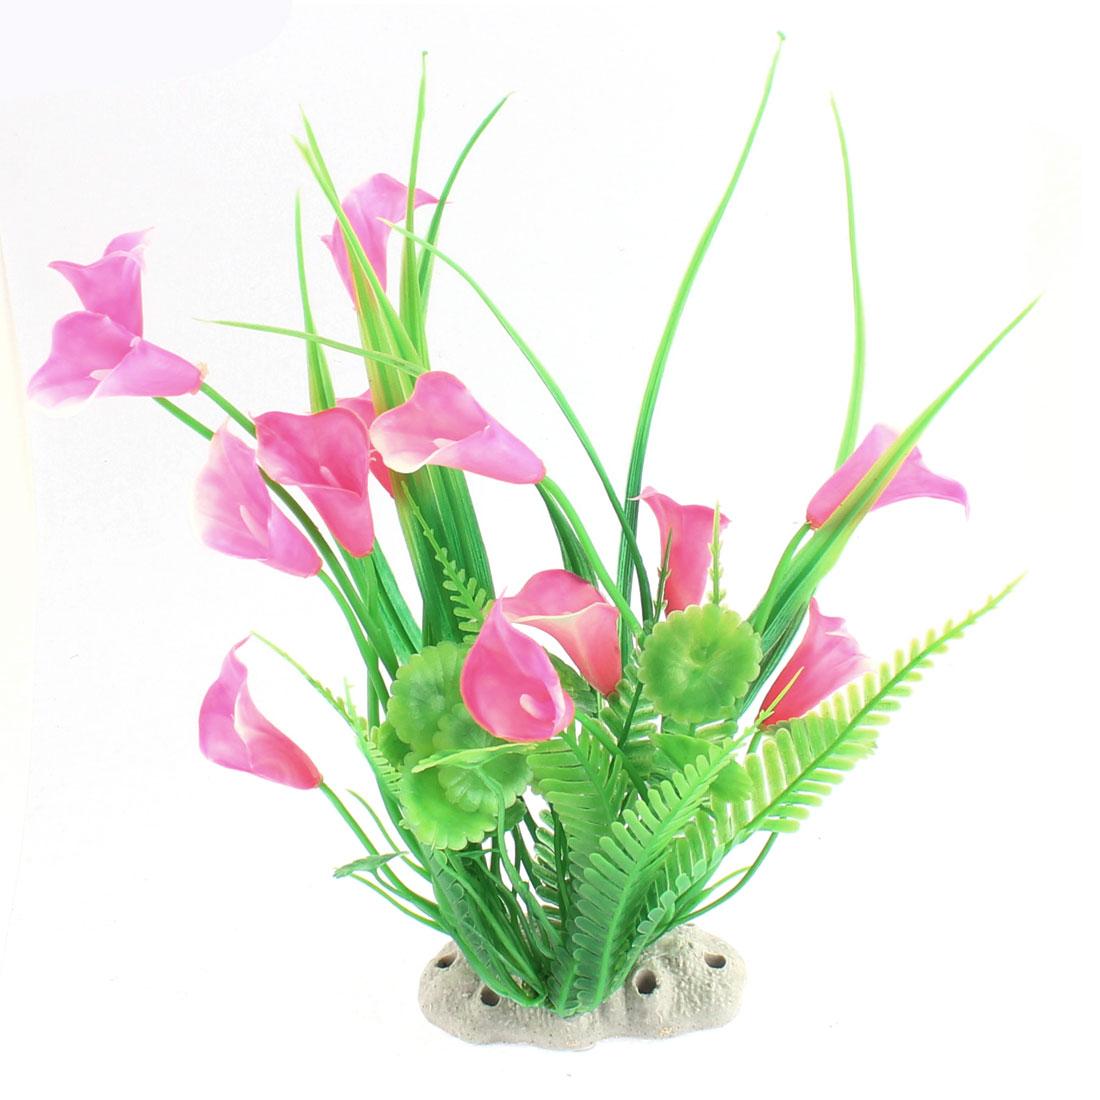 Imitated Plastic Water Plant Flower Grass Landscape Green Pink for Fish Tank Aquarium